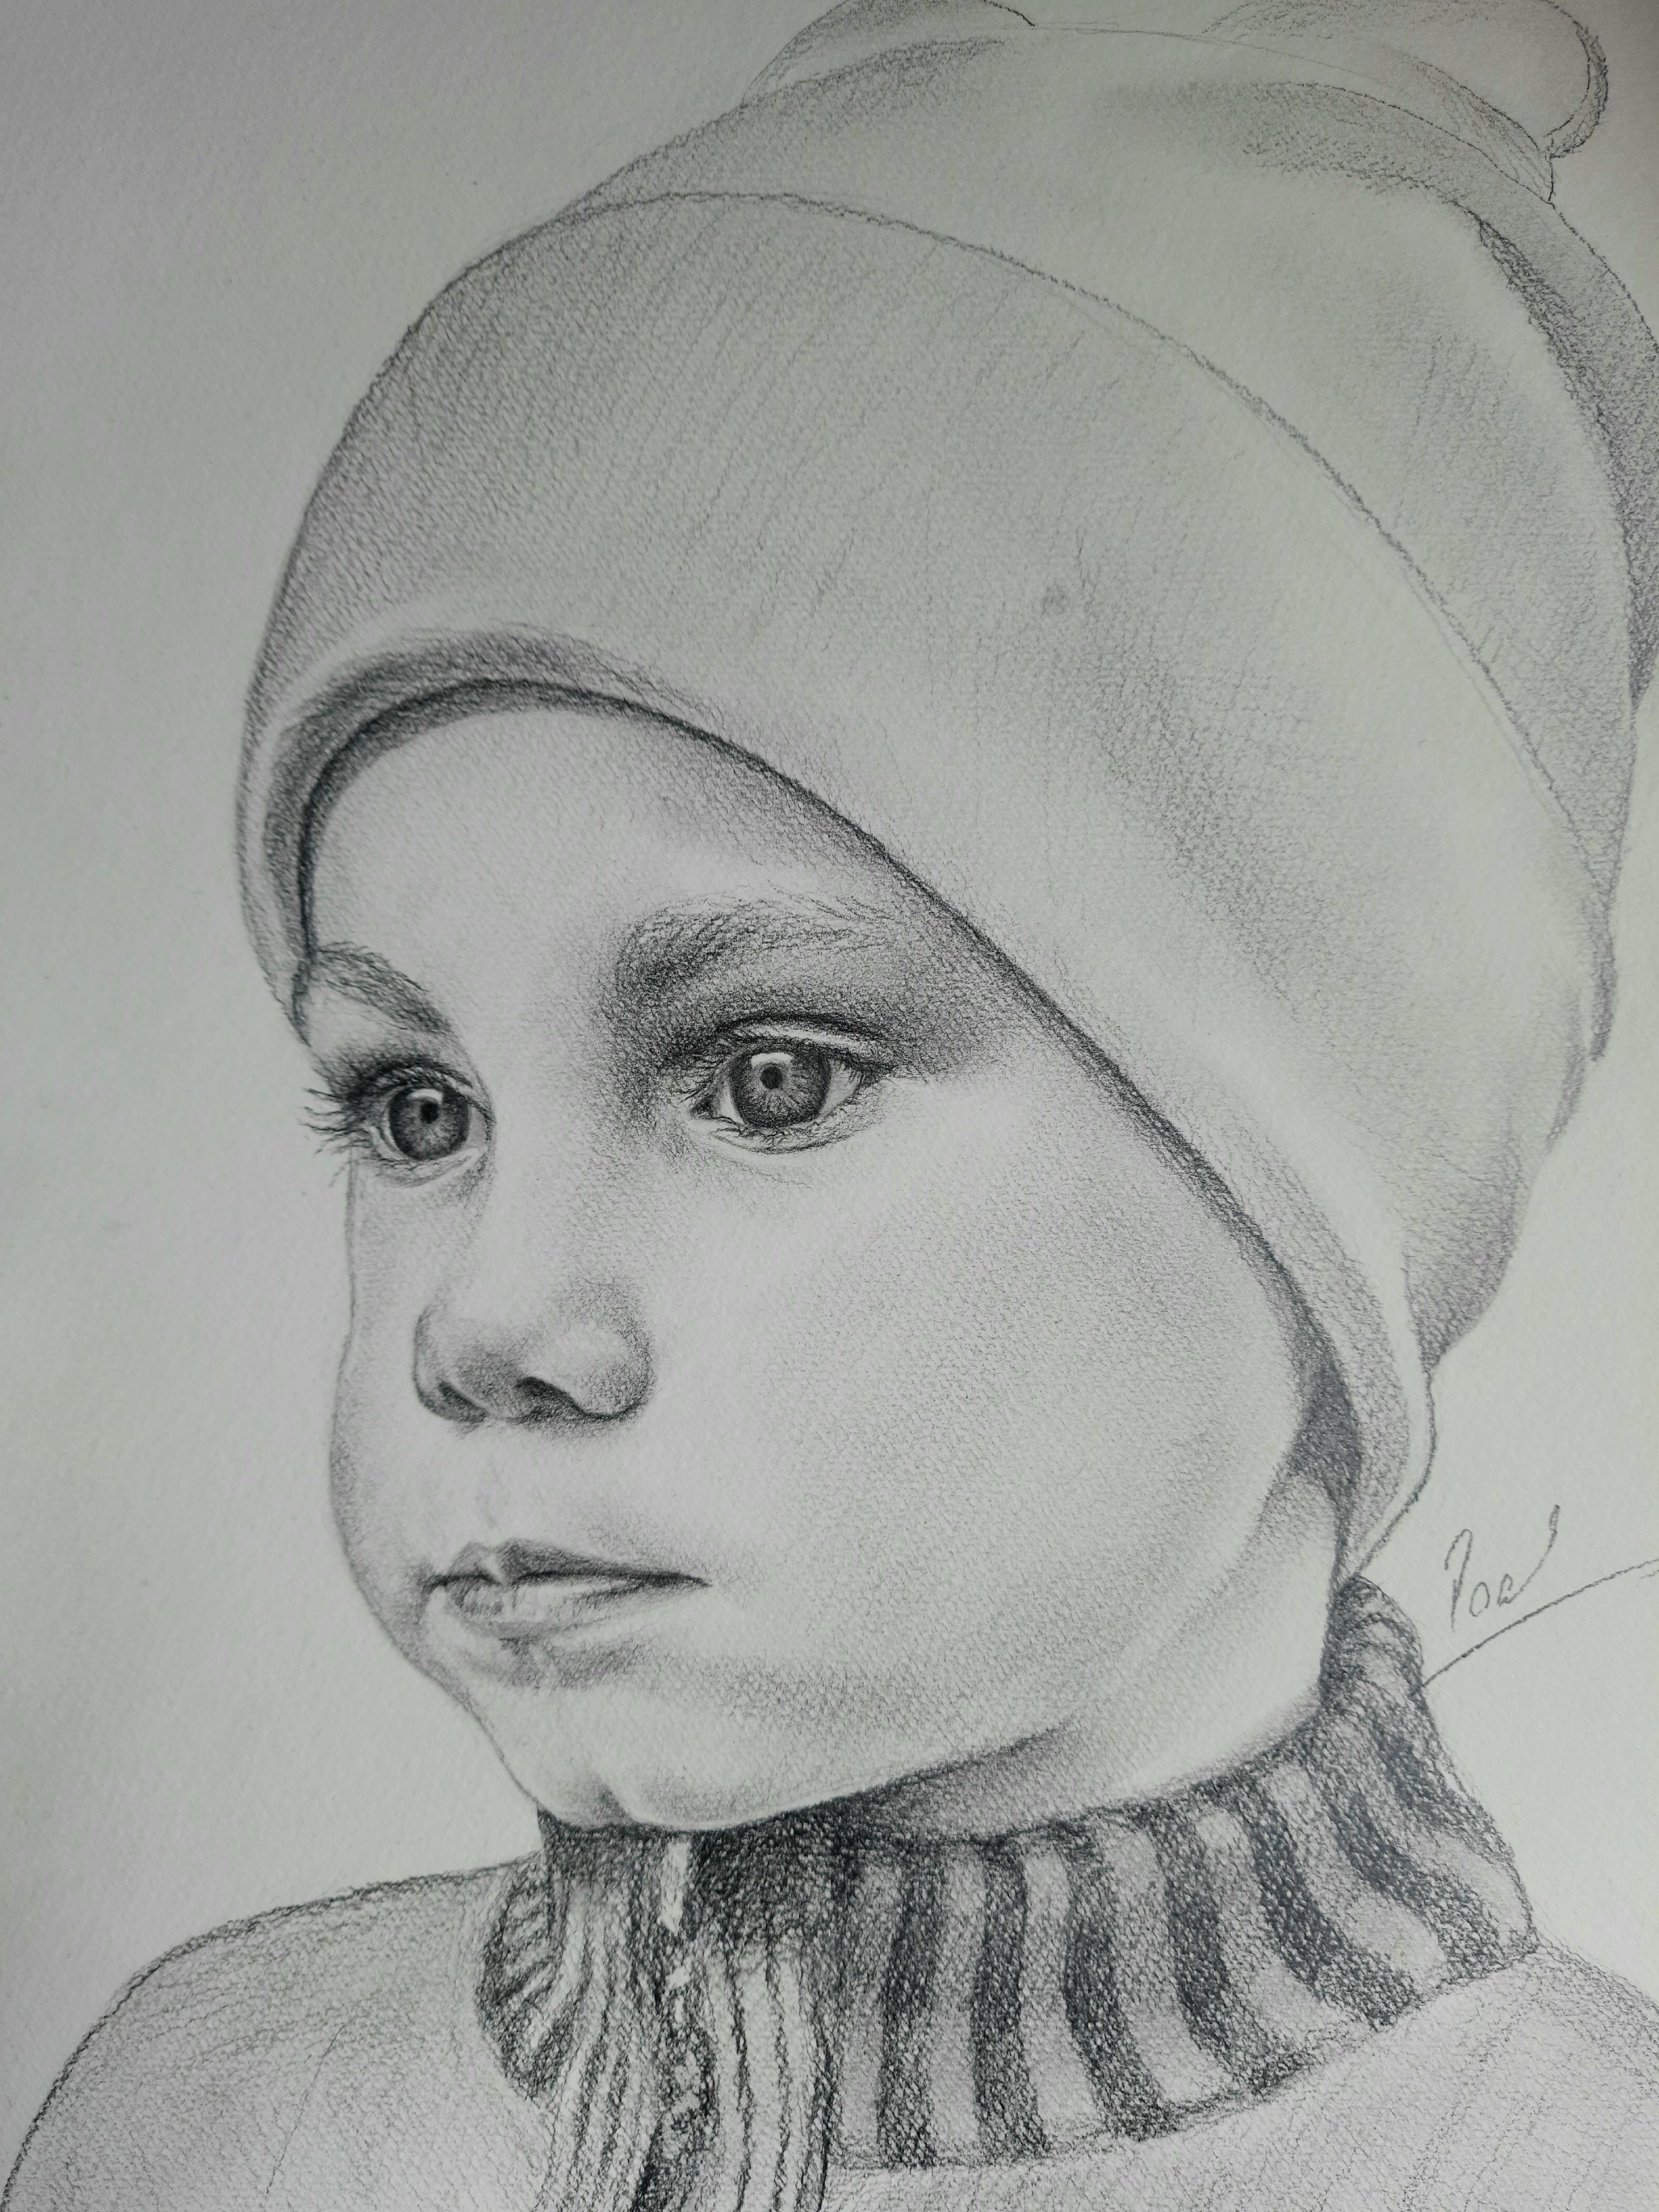 My son)